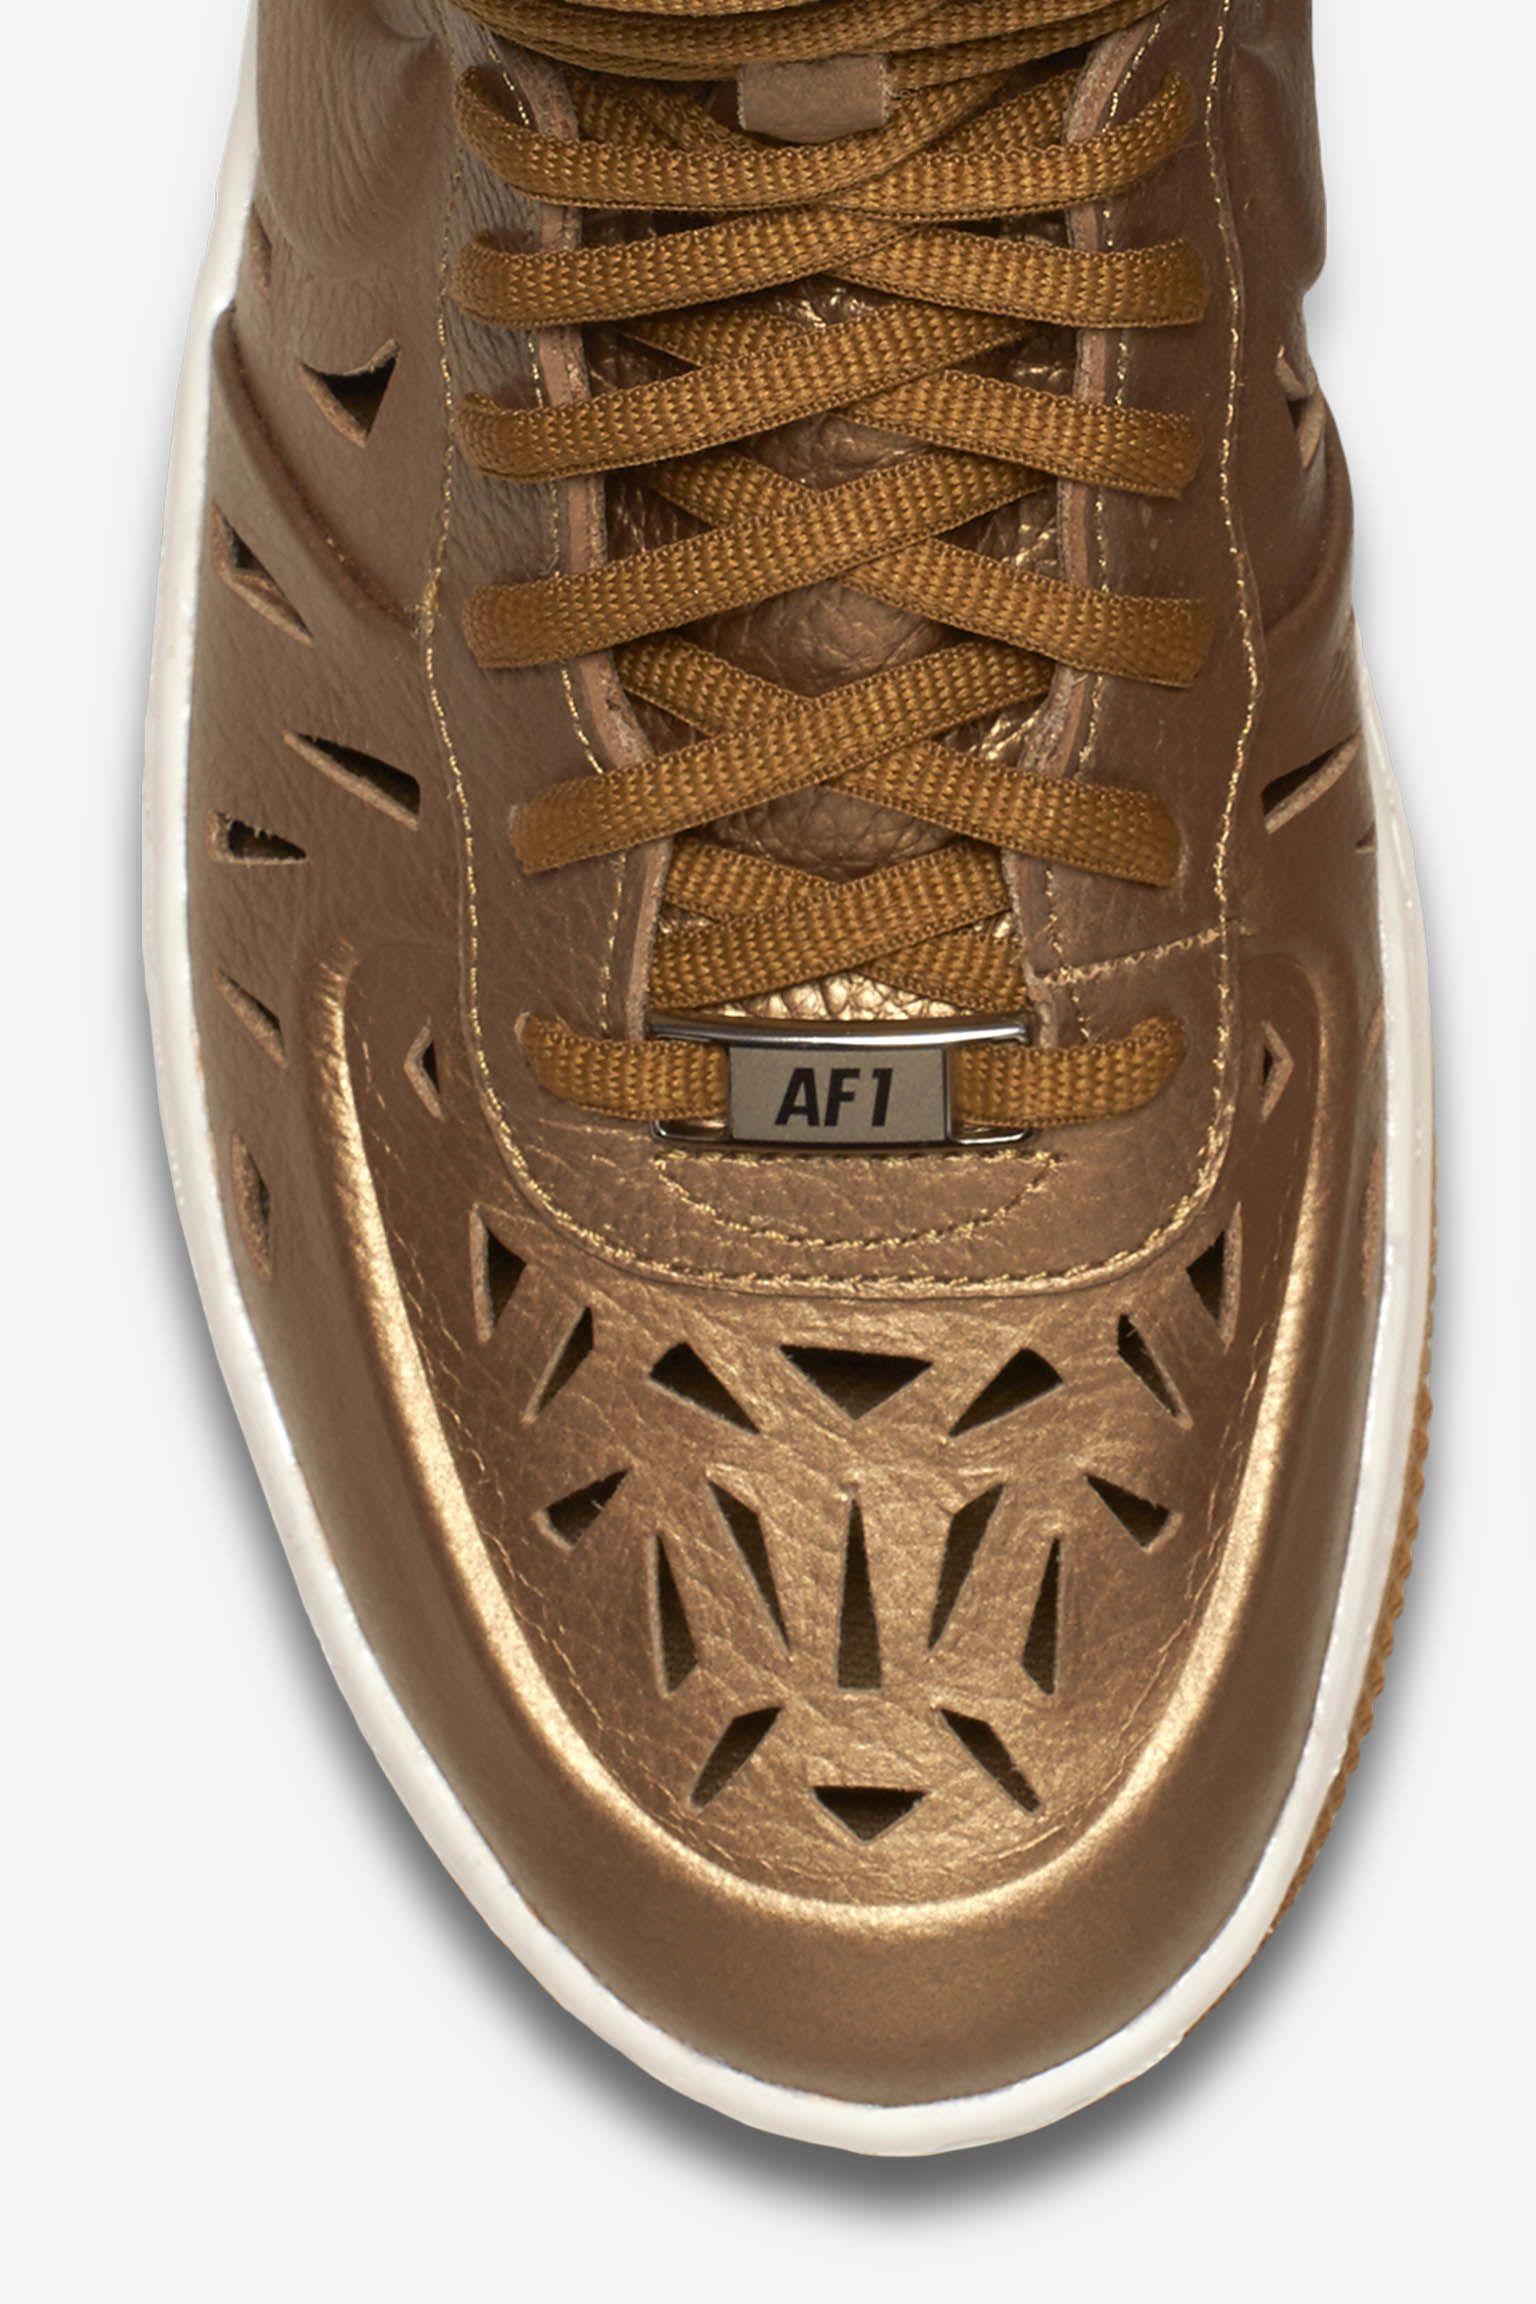 28bc5c568eaf74 ... Women s Nike Air Force 1 Ultra Mid Joli Metallic Golden Tan .